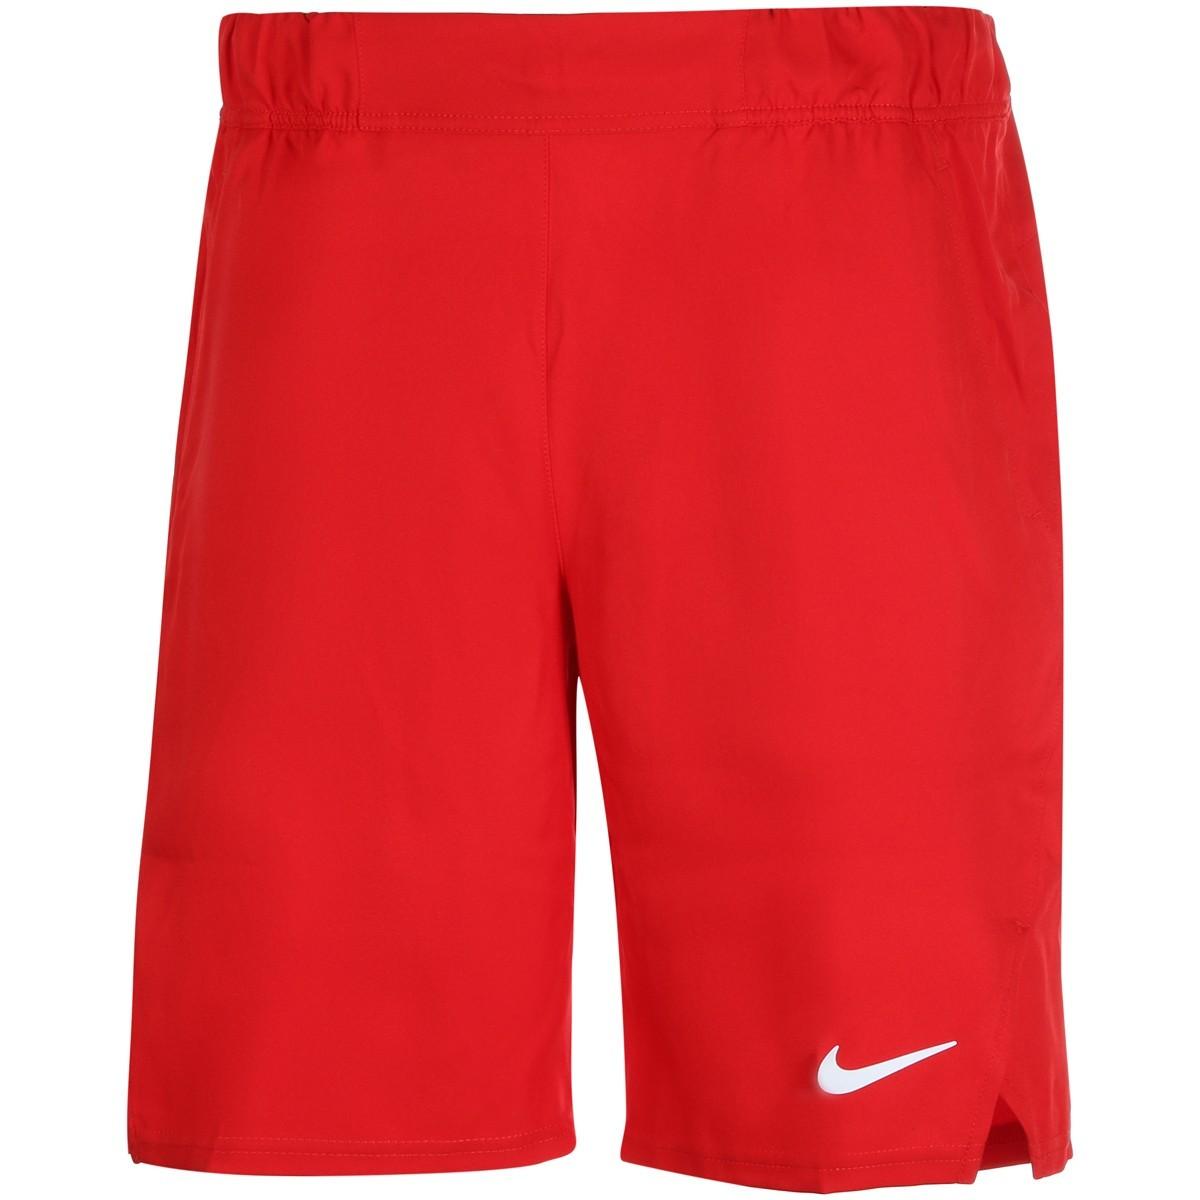 Теннисные шорты мужские Nike Court Flex Victory 9IN Short university red/white